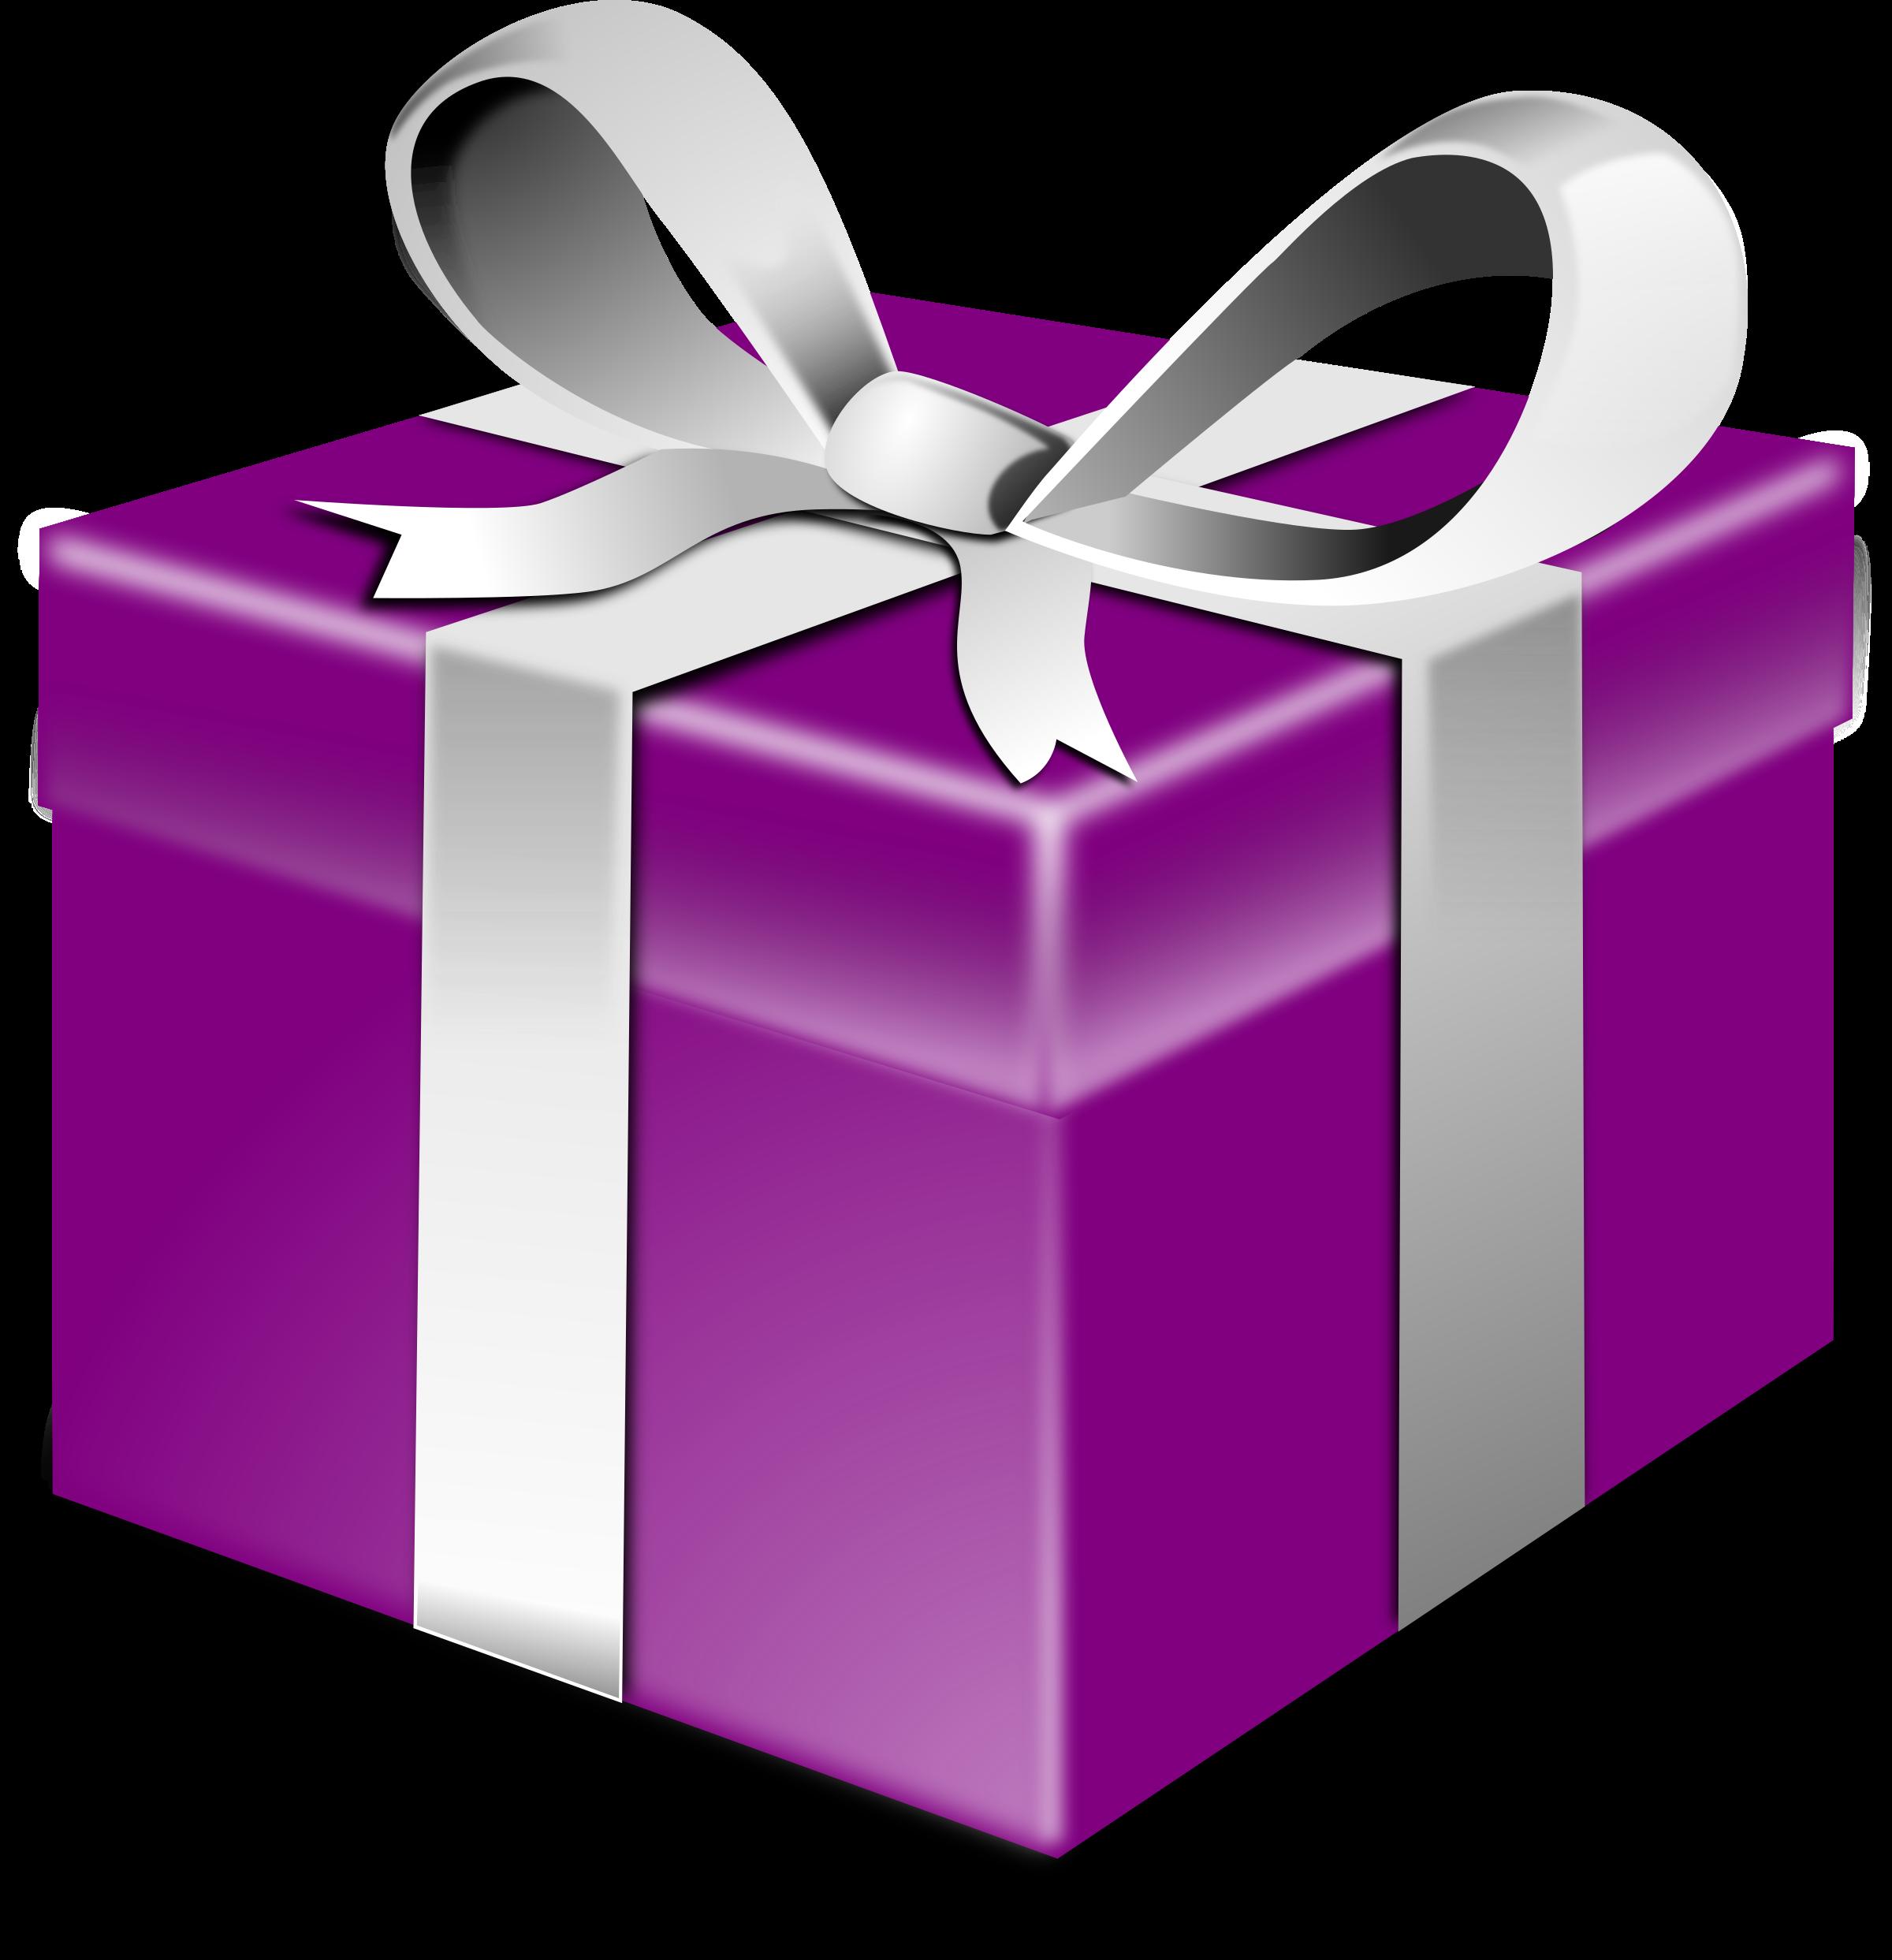 Christmas present clipart jpg royalty free Clipart - Purple present jpg royalty free